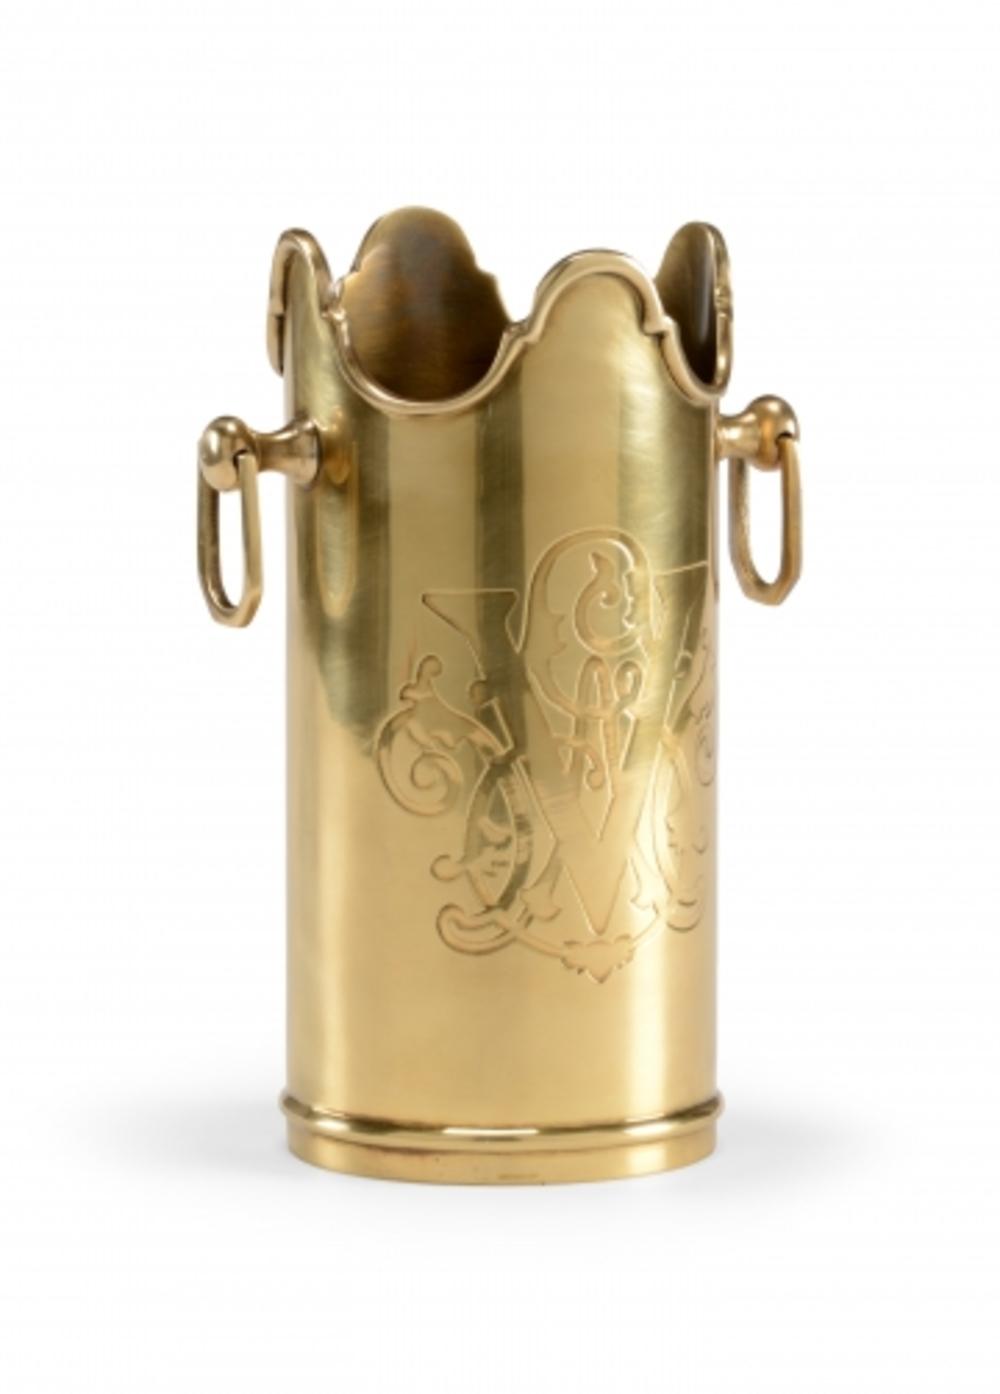 Wildwood Lamp - Vanderbilt Chiller, Brass